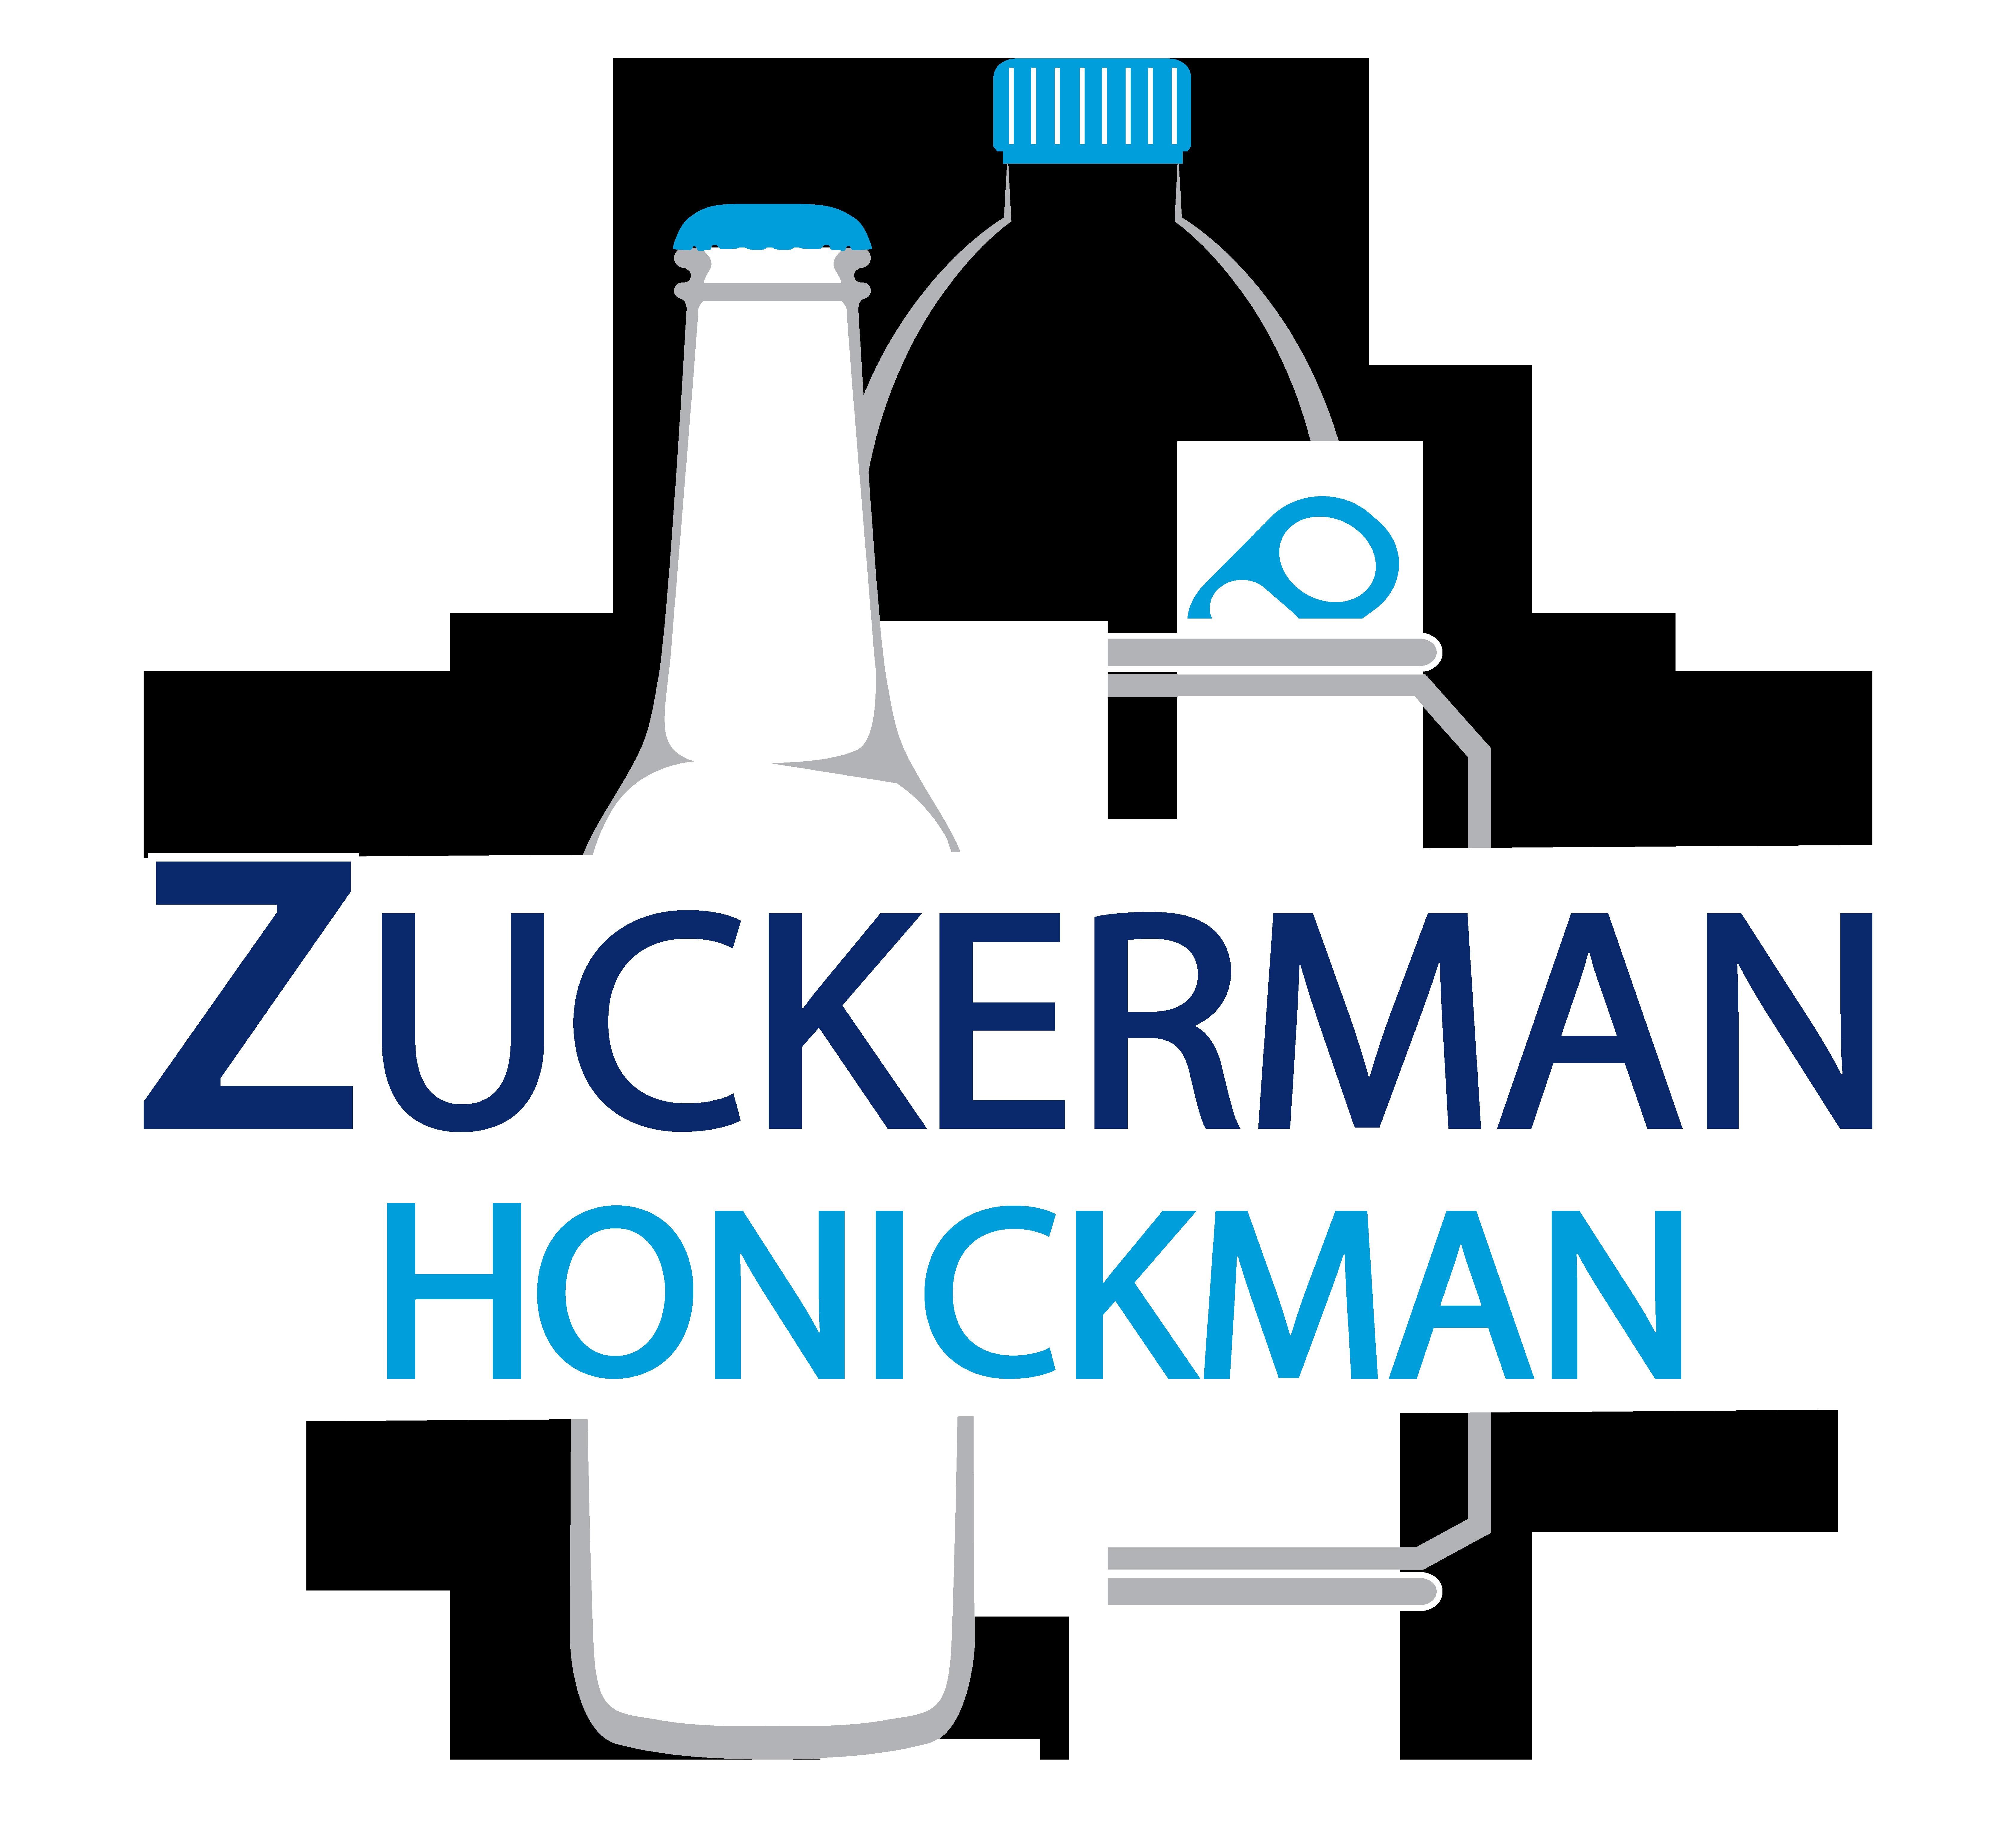 Zuckerman Honickman - sponsoring BevNET Live Winter 2019